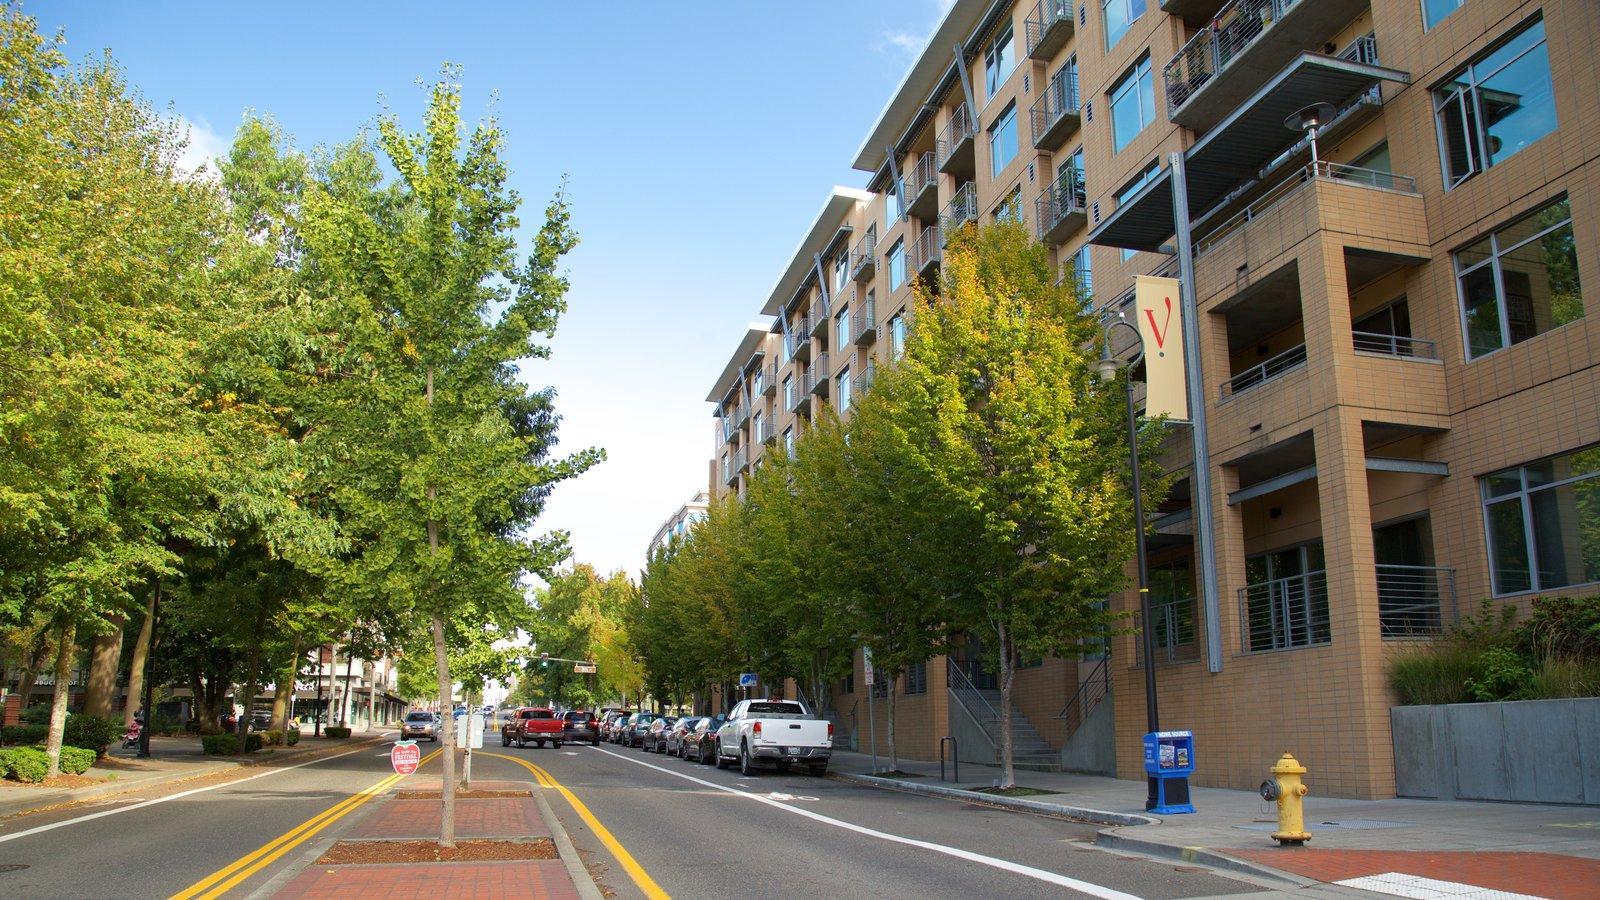 Vancouver que inclui cenas de rua